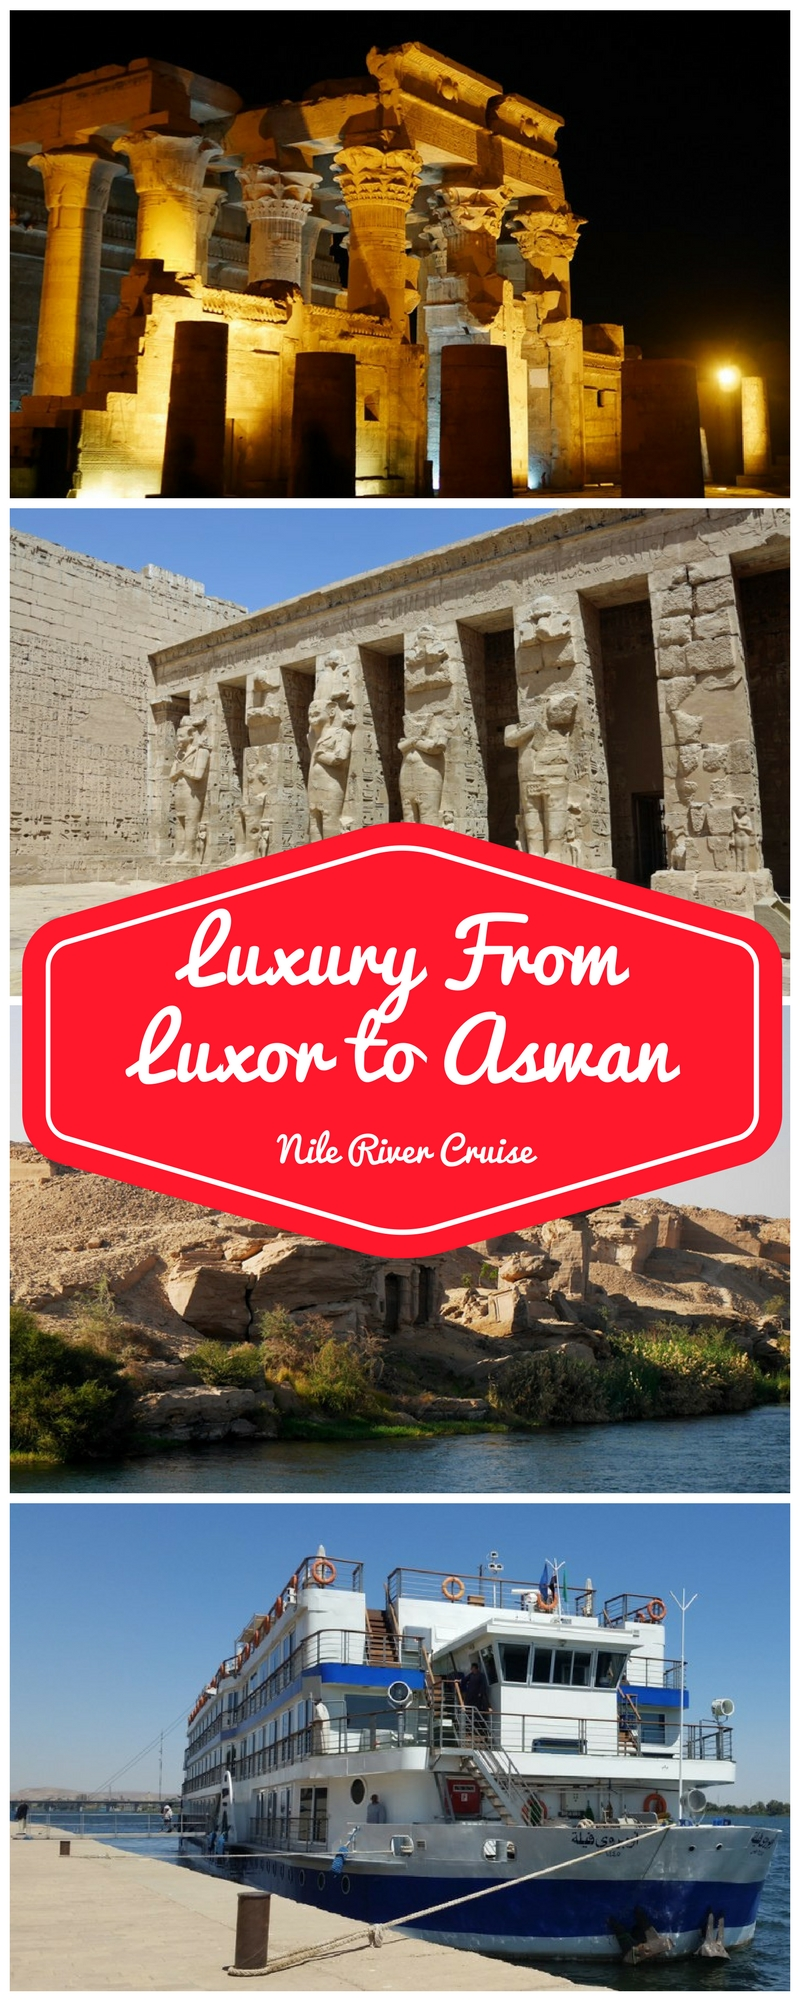 http://www.london-unattached.com/2016/03/nile-river-cruise-luxor-aswan/